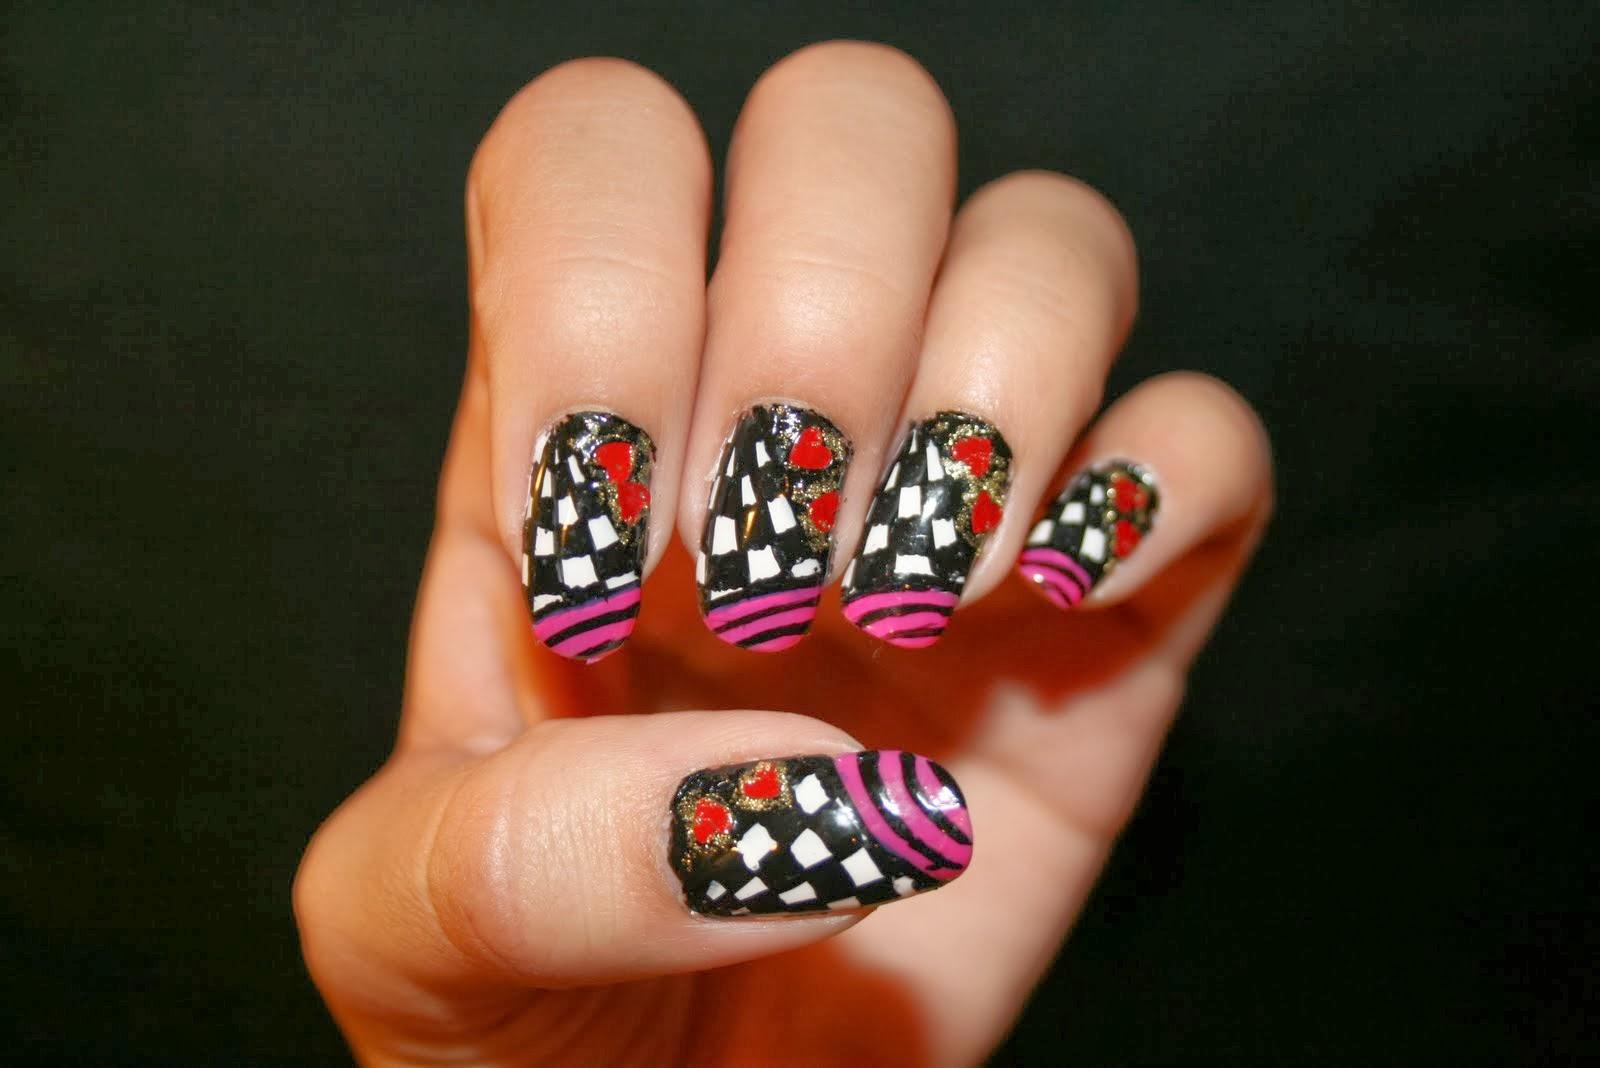 Awe-Inspiring Short Nail Design 2013   Nail Art Ideas 101